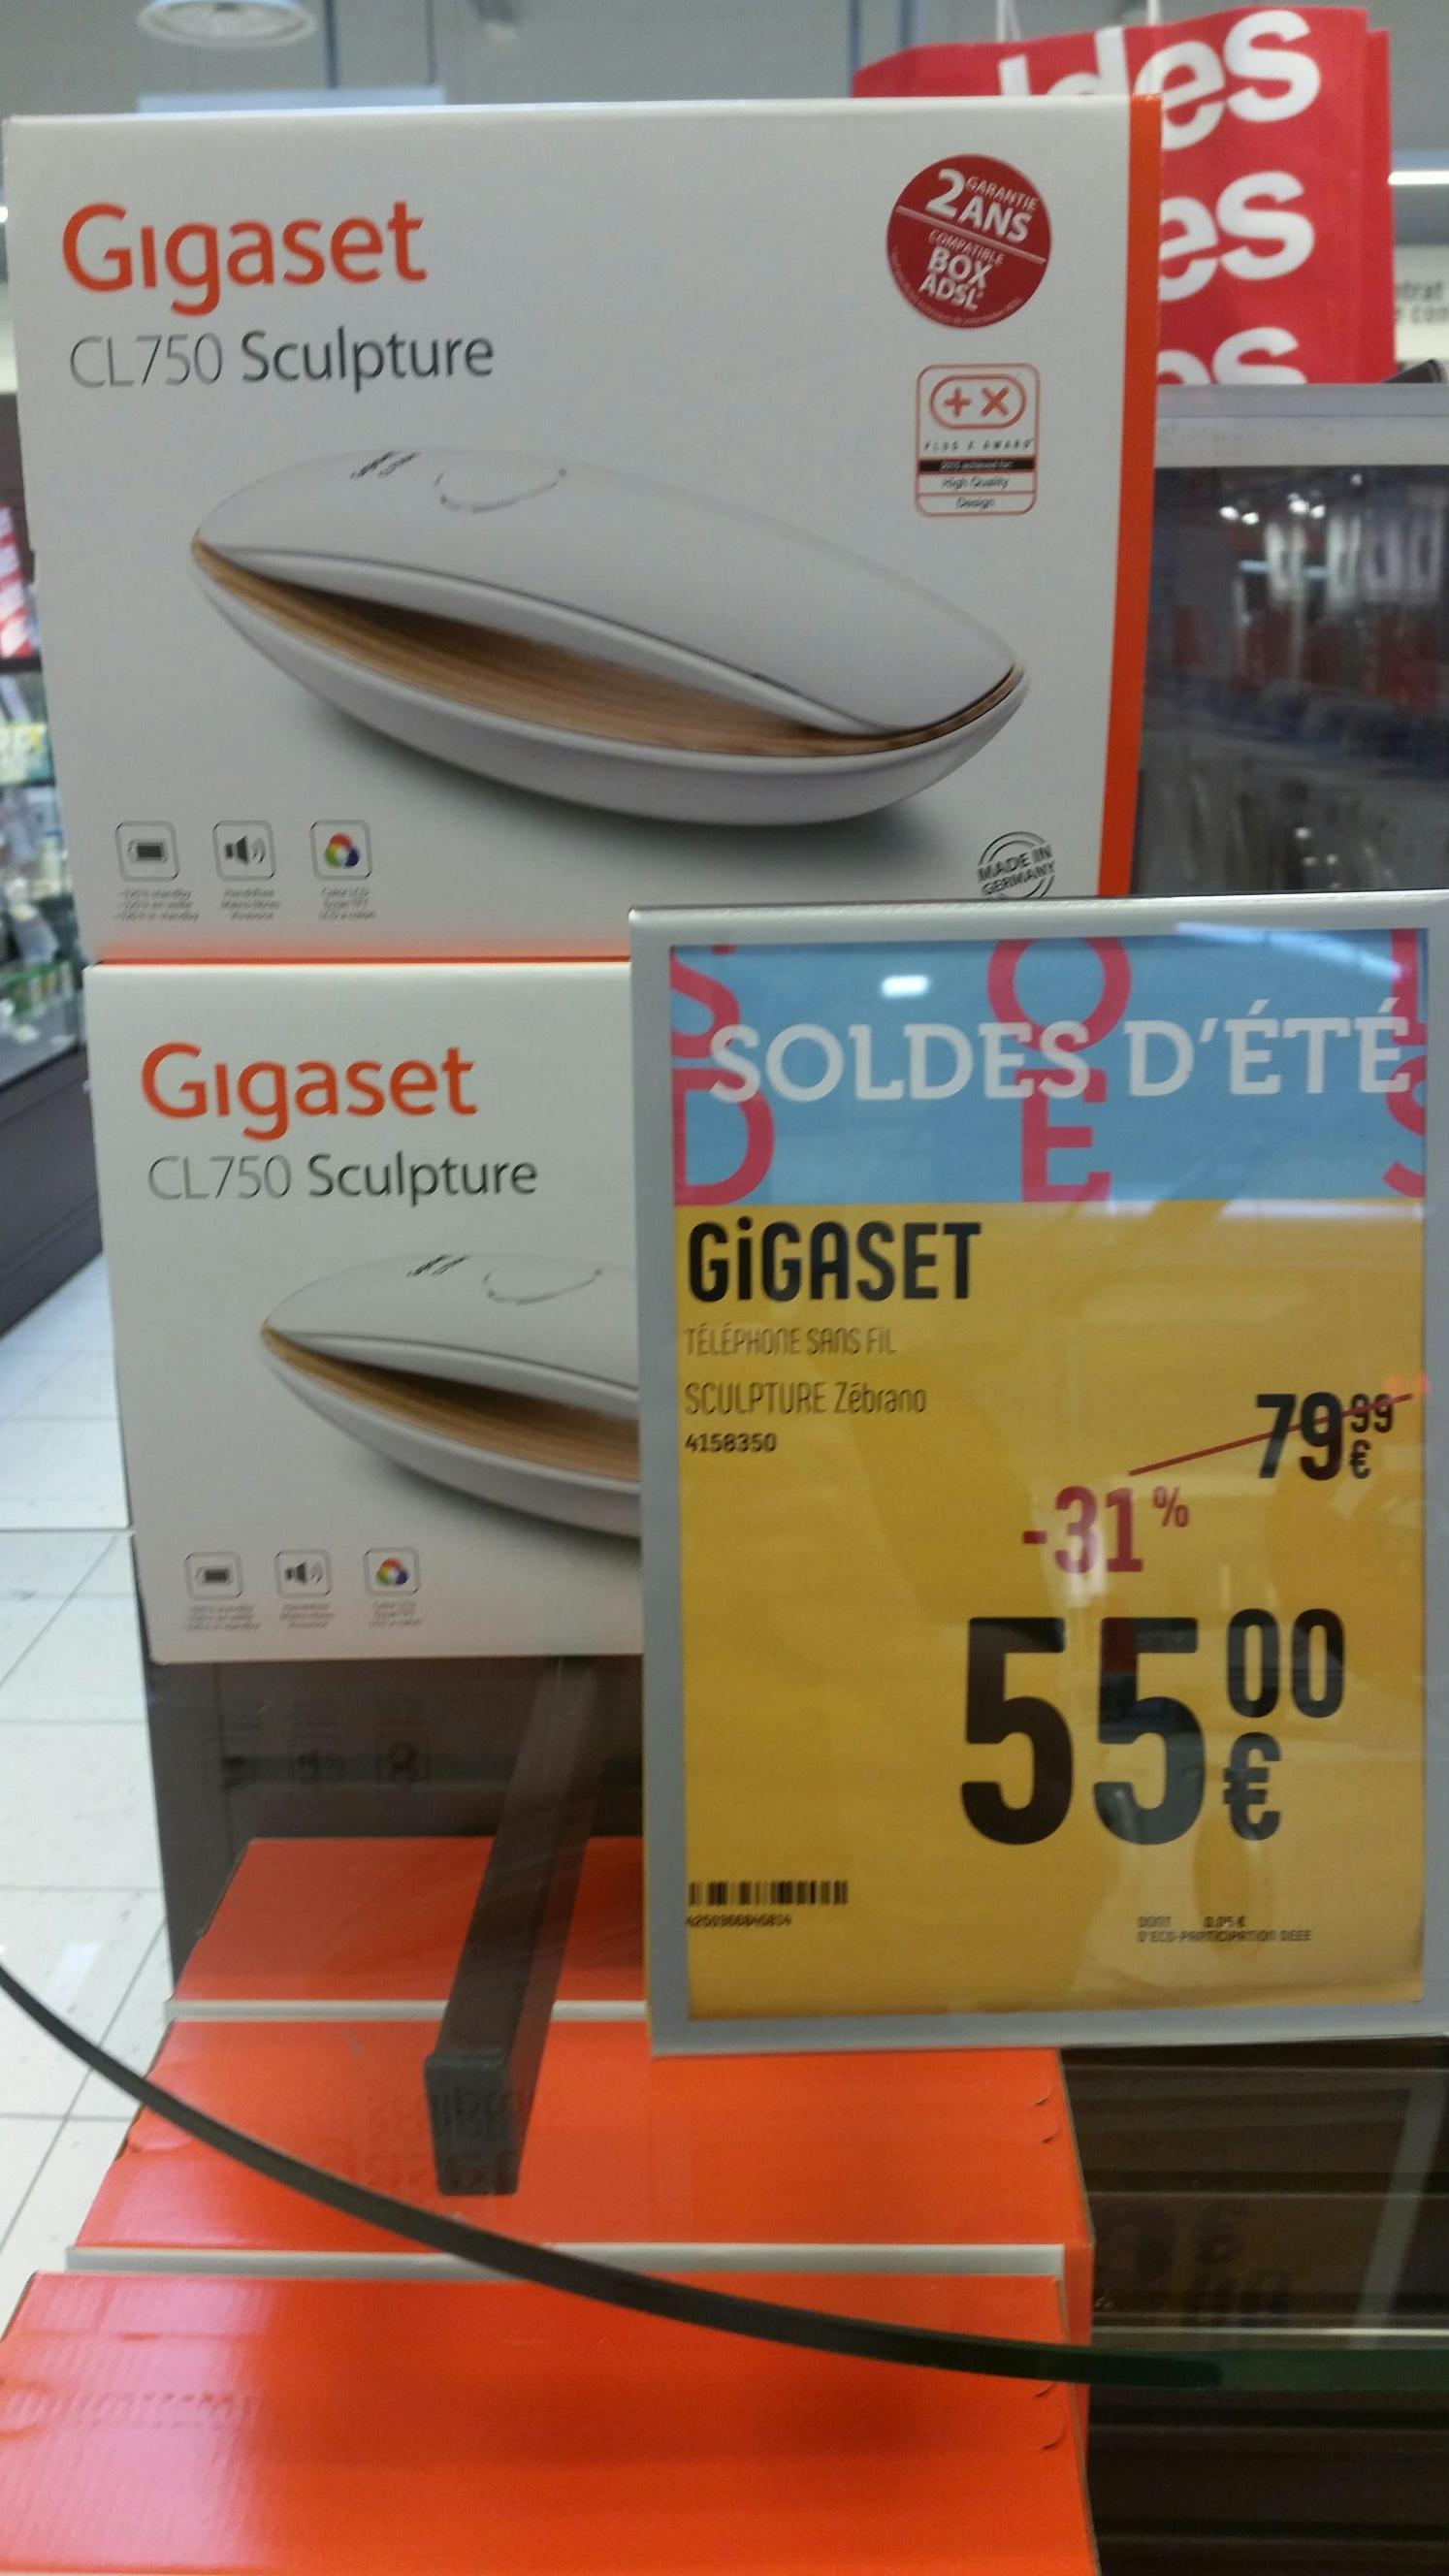 Téléphone fixe Gigaset CL750 Sculpture (via ODR de 30€)